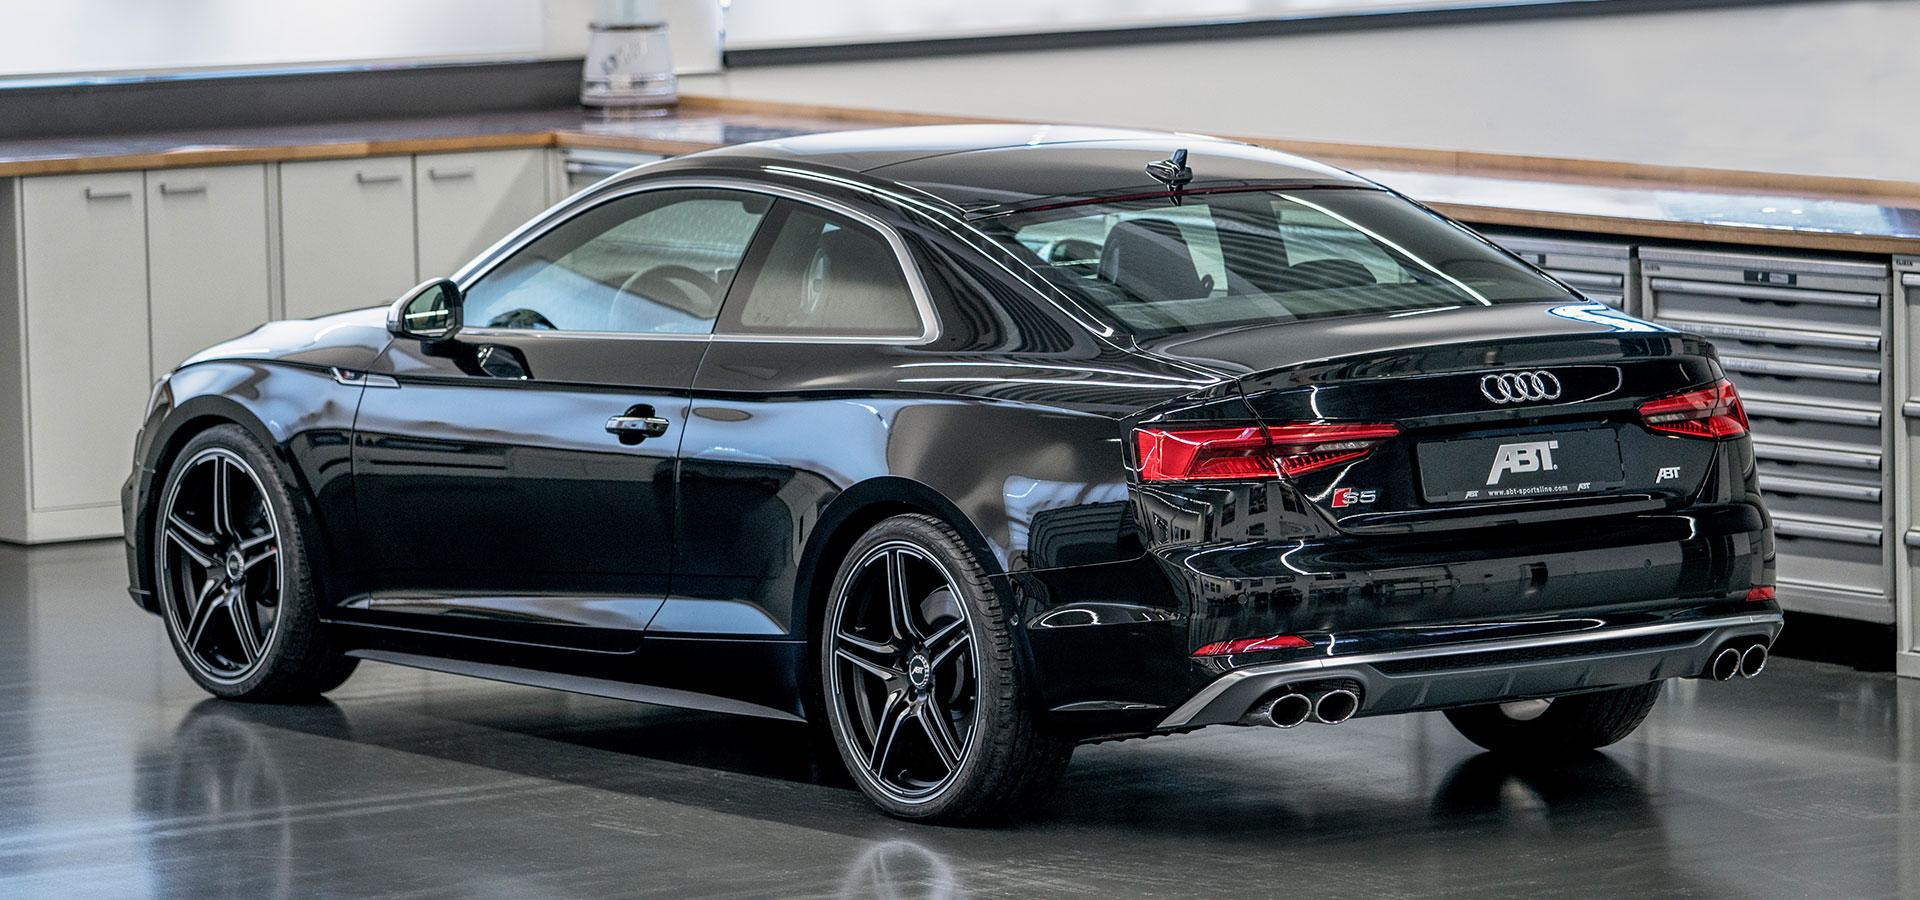 Audi S ABT Sportsline - S5 audi